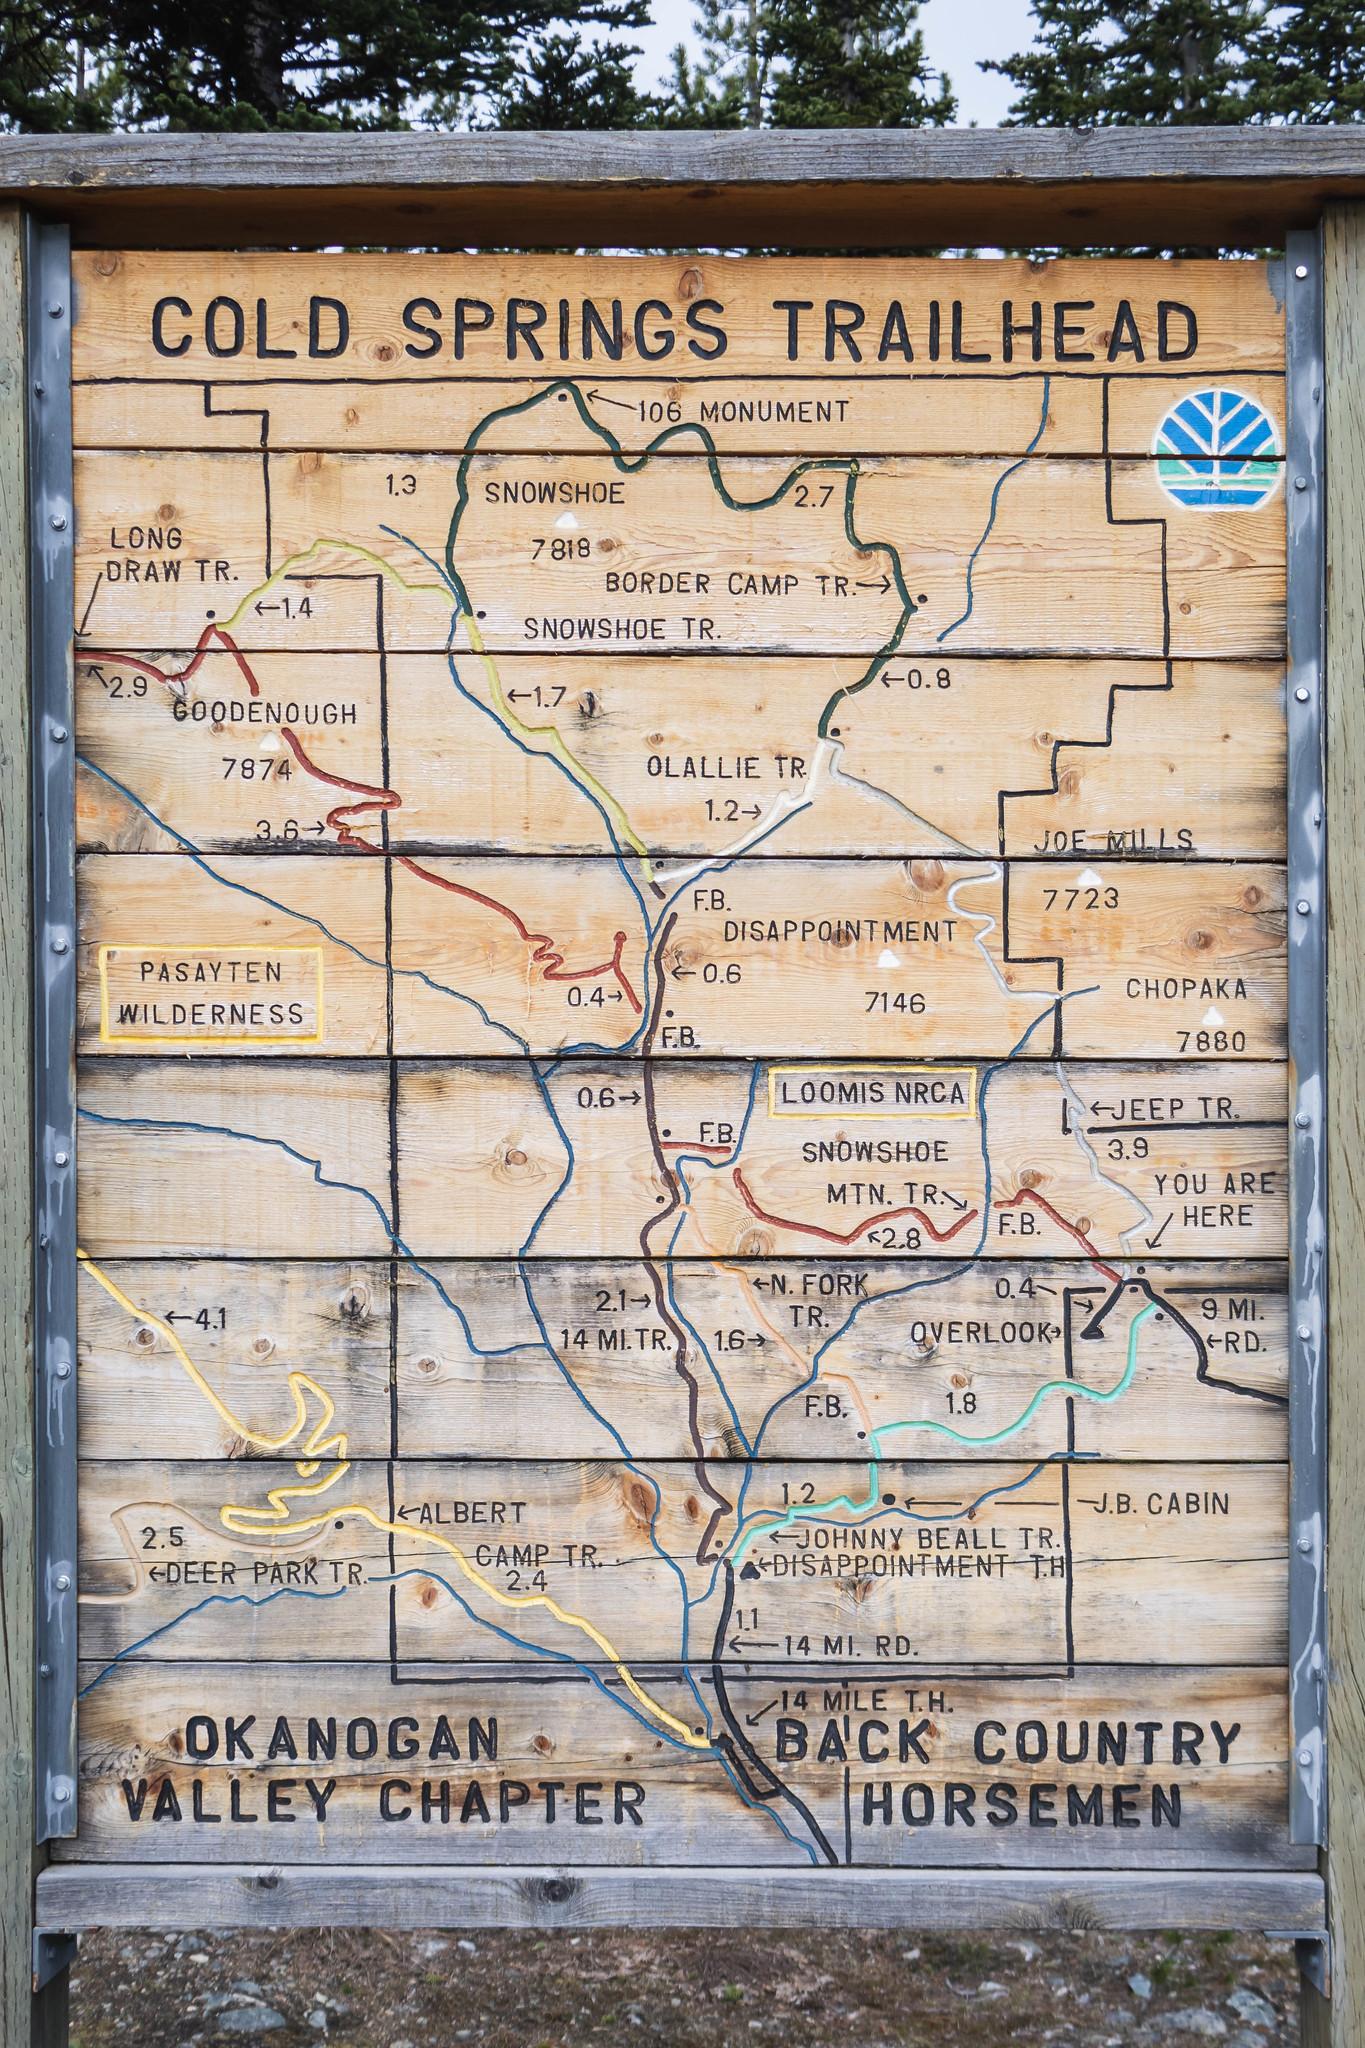 Gold Springs Trailhead